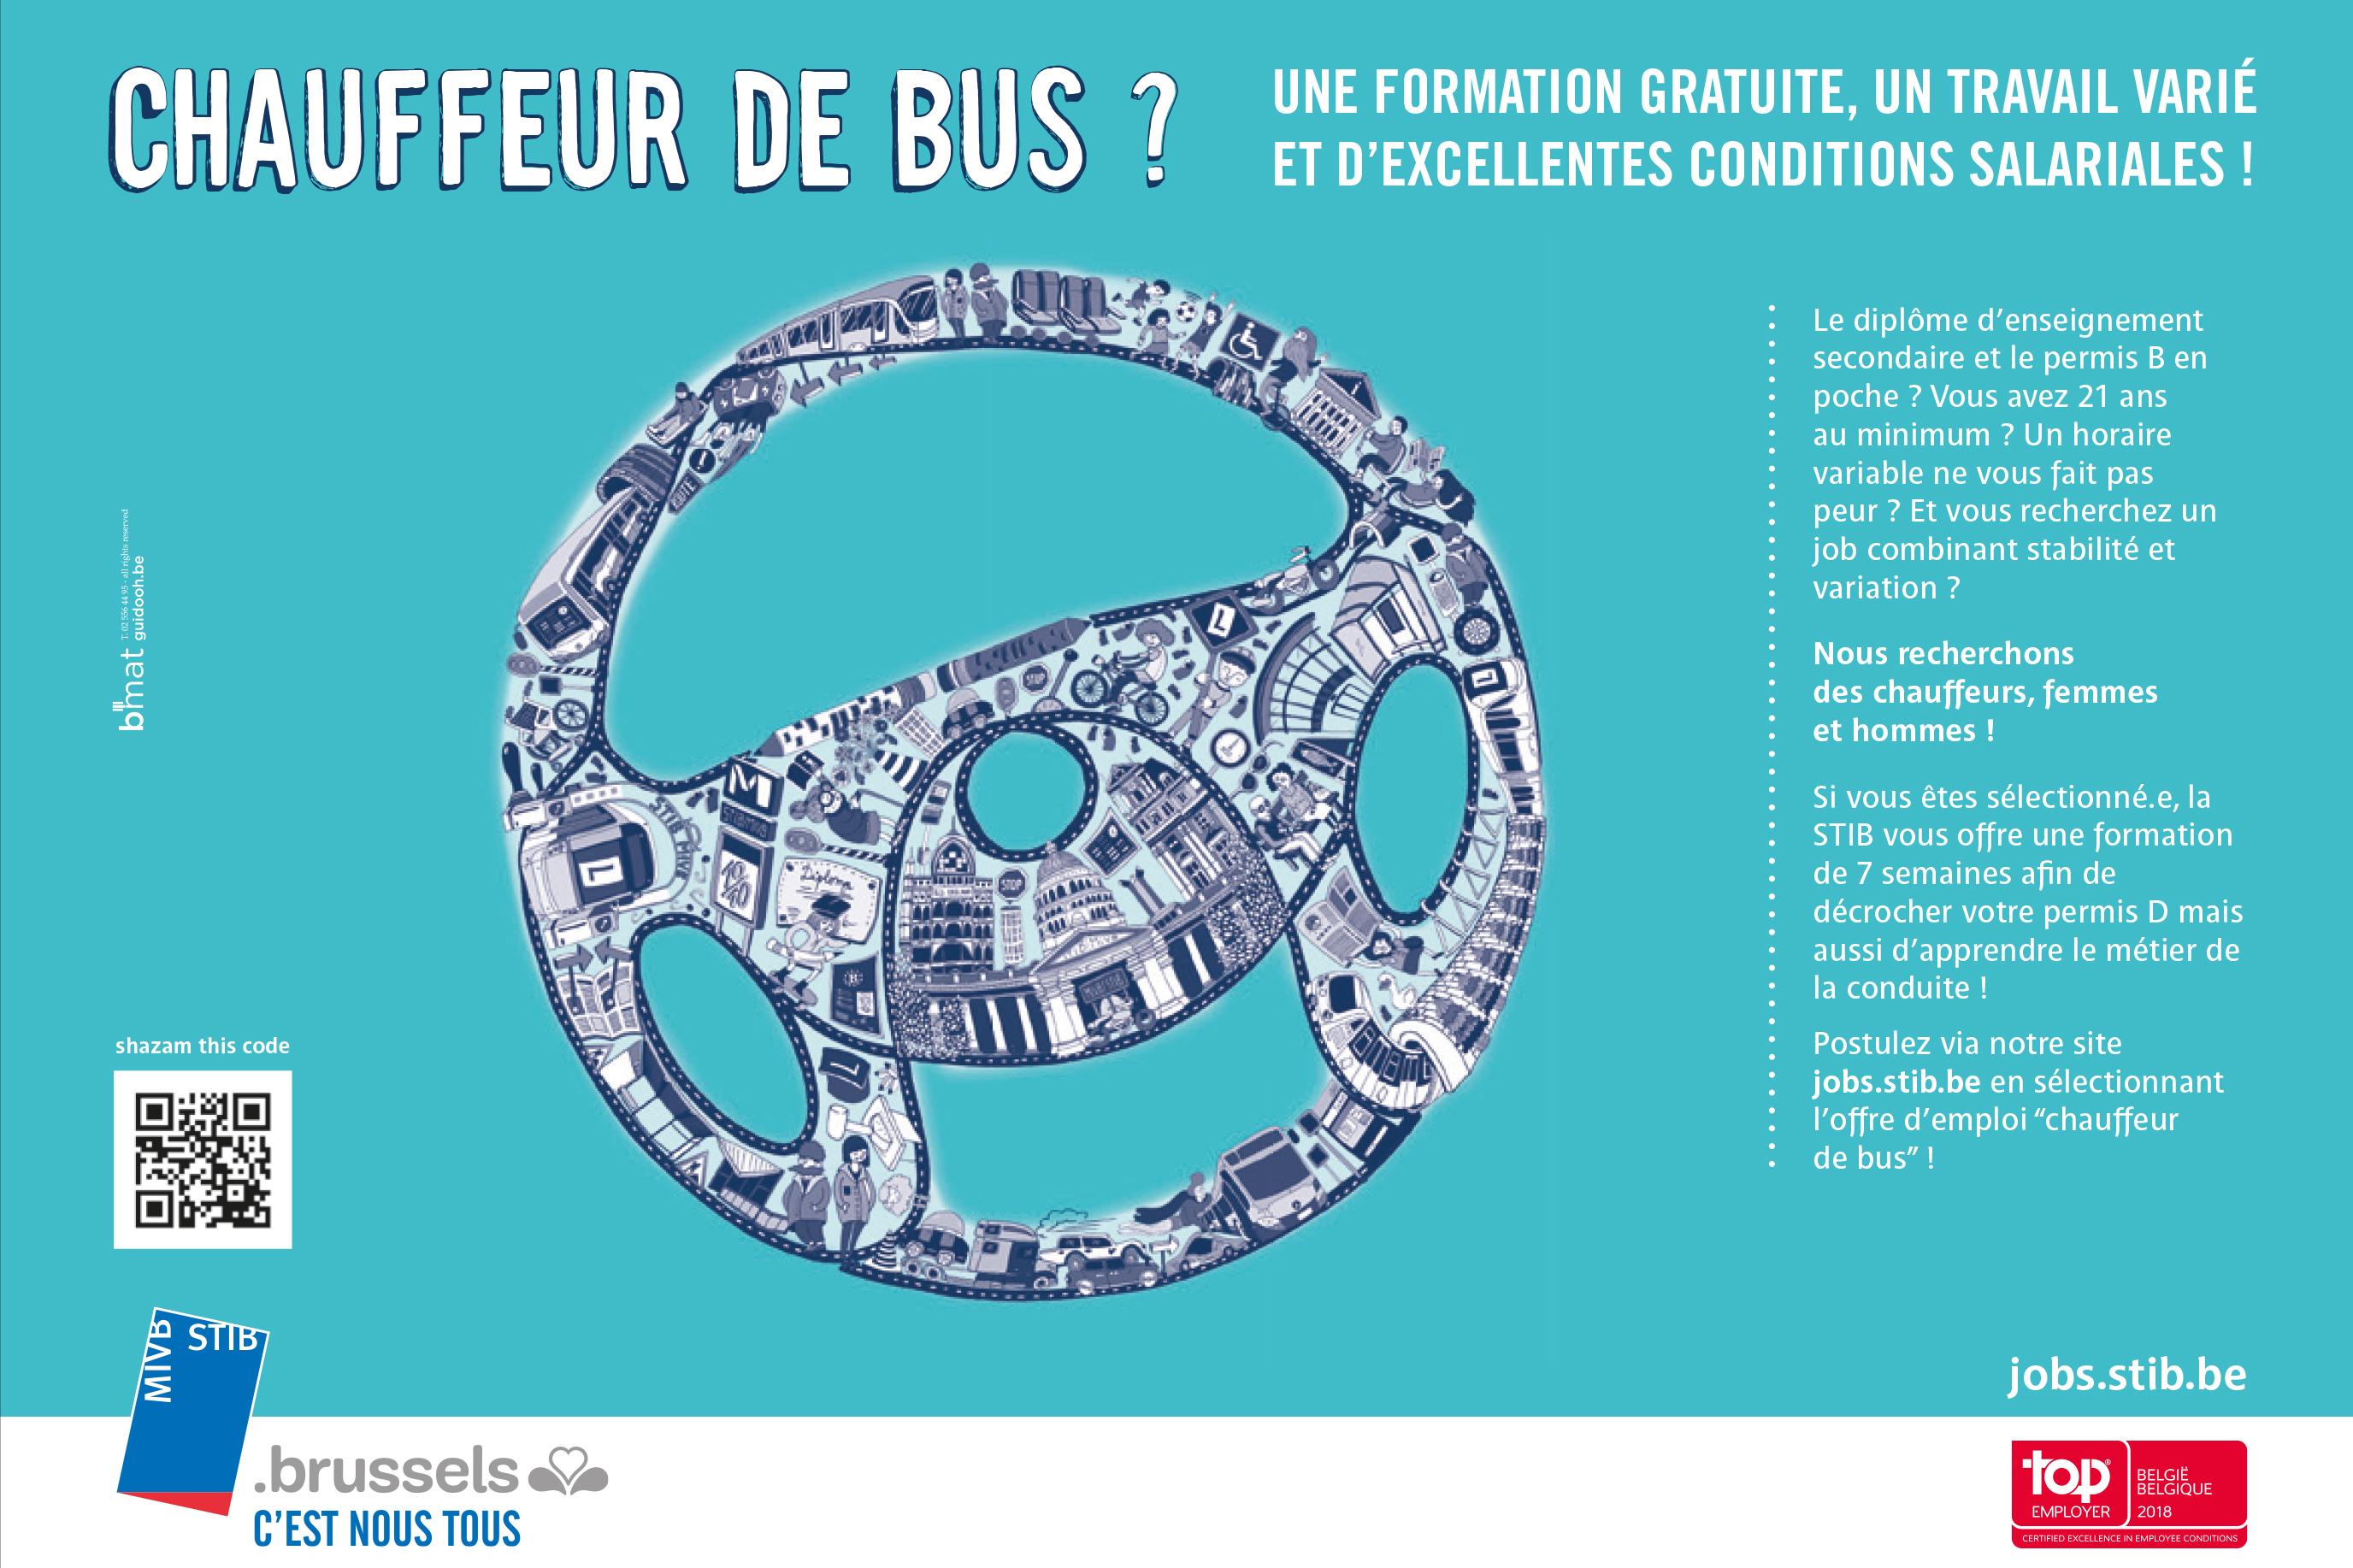 buschauffeur-4